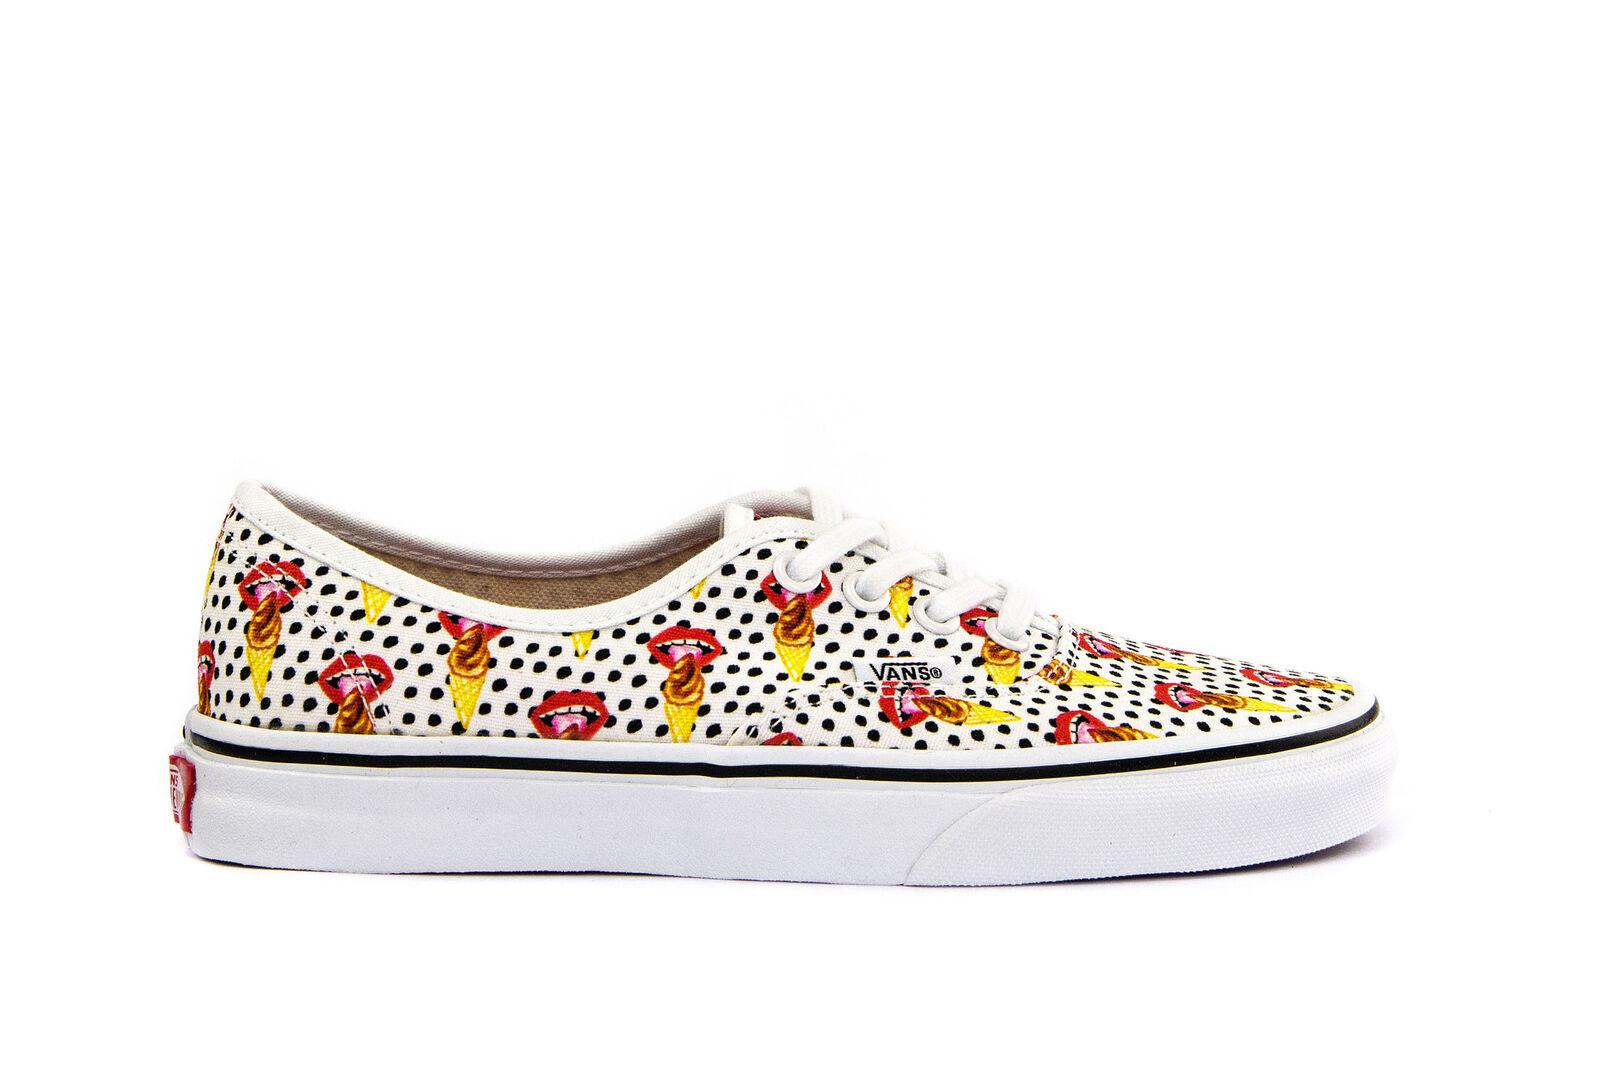 4d506e67a99e97 Buy VANS Authentic Womens Kendra Dandy I Scream White Canvas Shoes ...